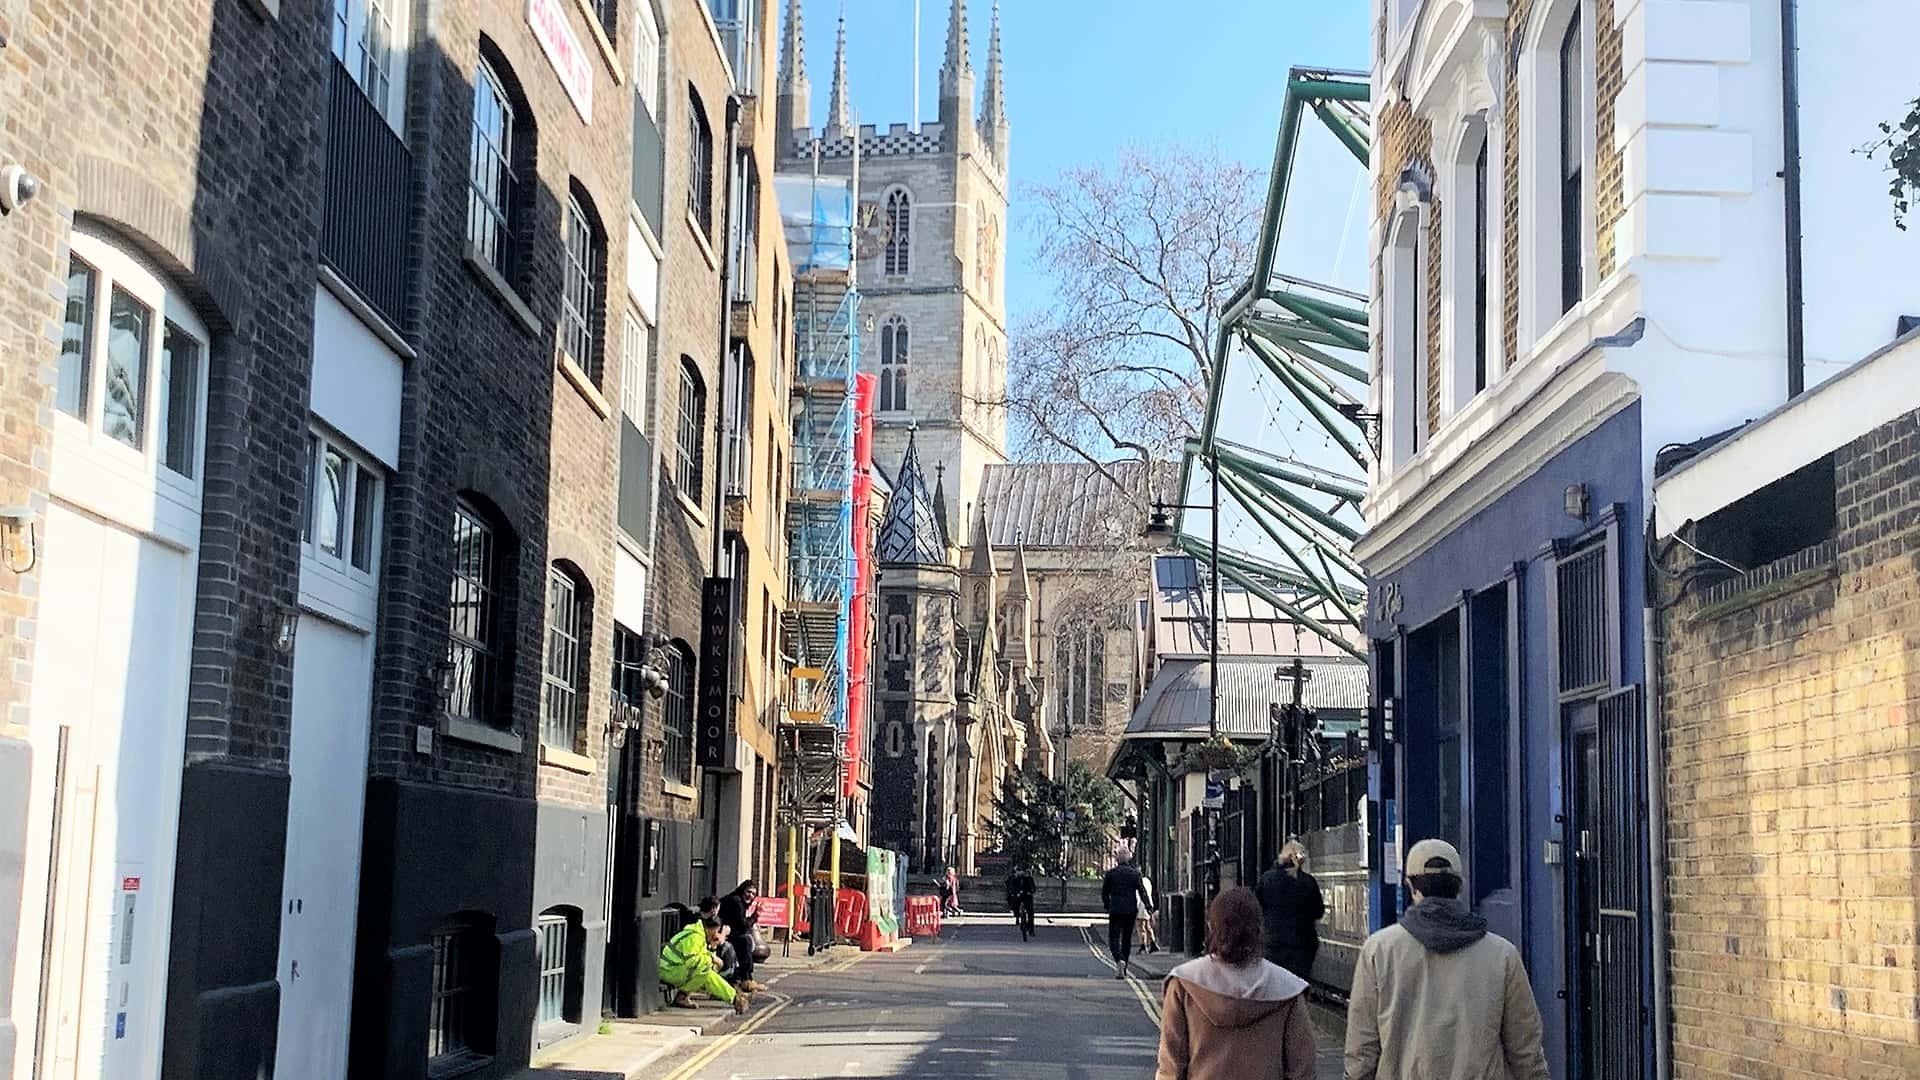 Streets of London – Virtual Tour of London